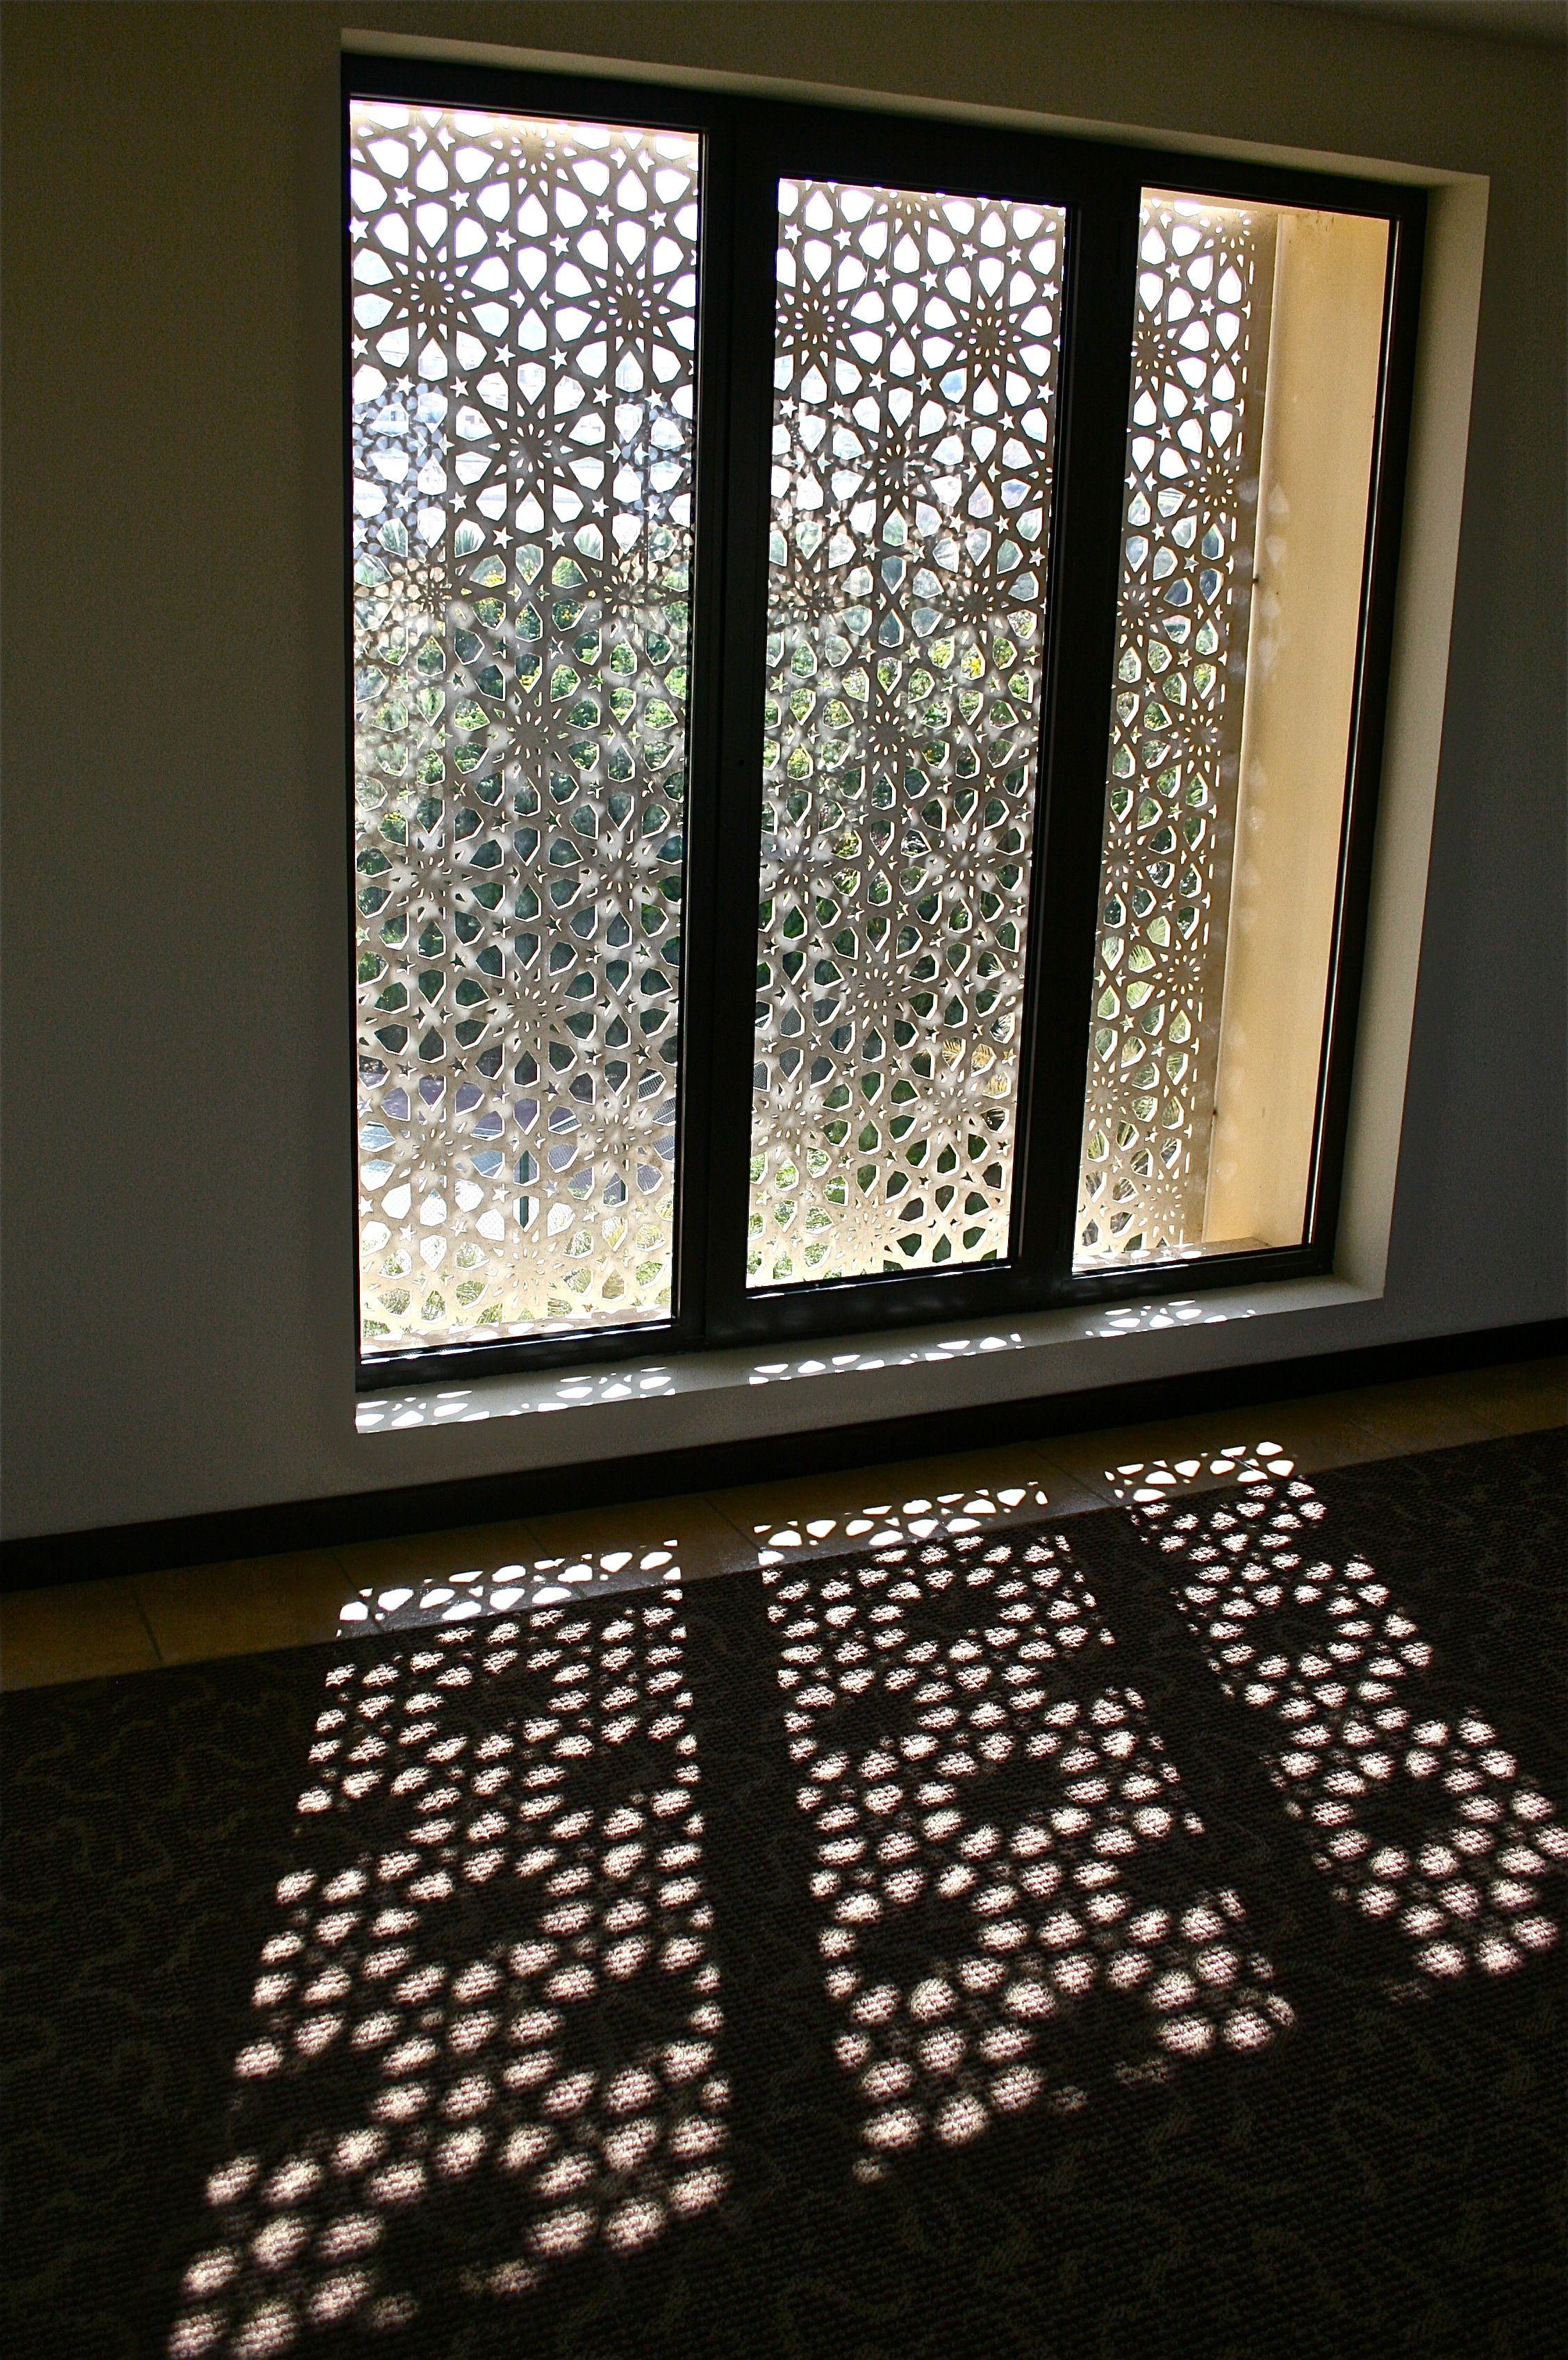 #Window #Shangri-La #Muscat Photography: Marianne de Bourg